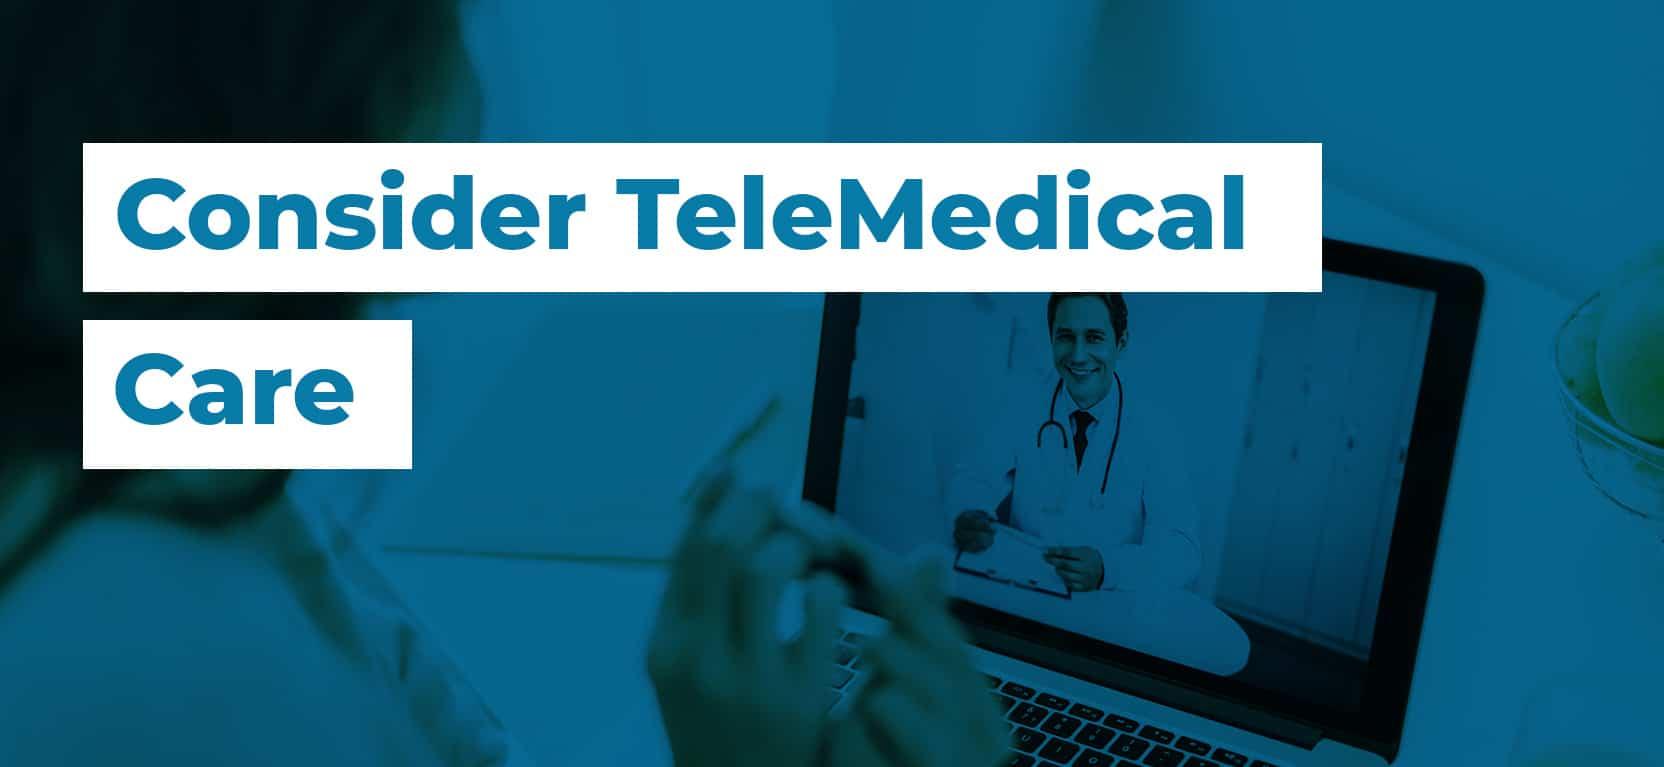 02 Consider TeleMedical Care3